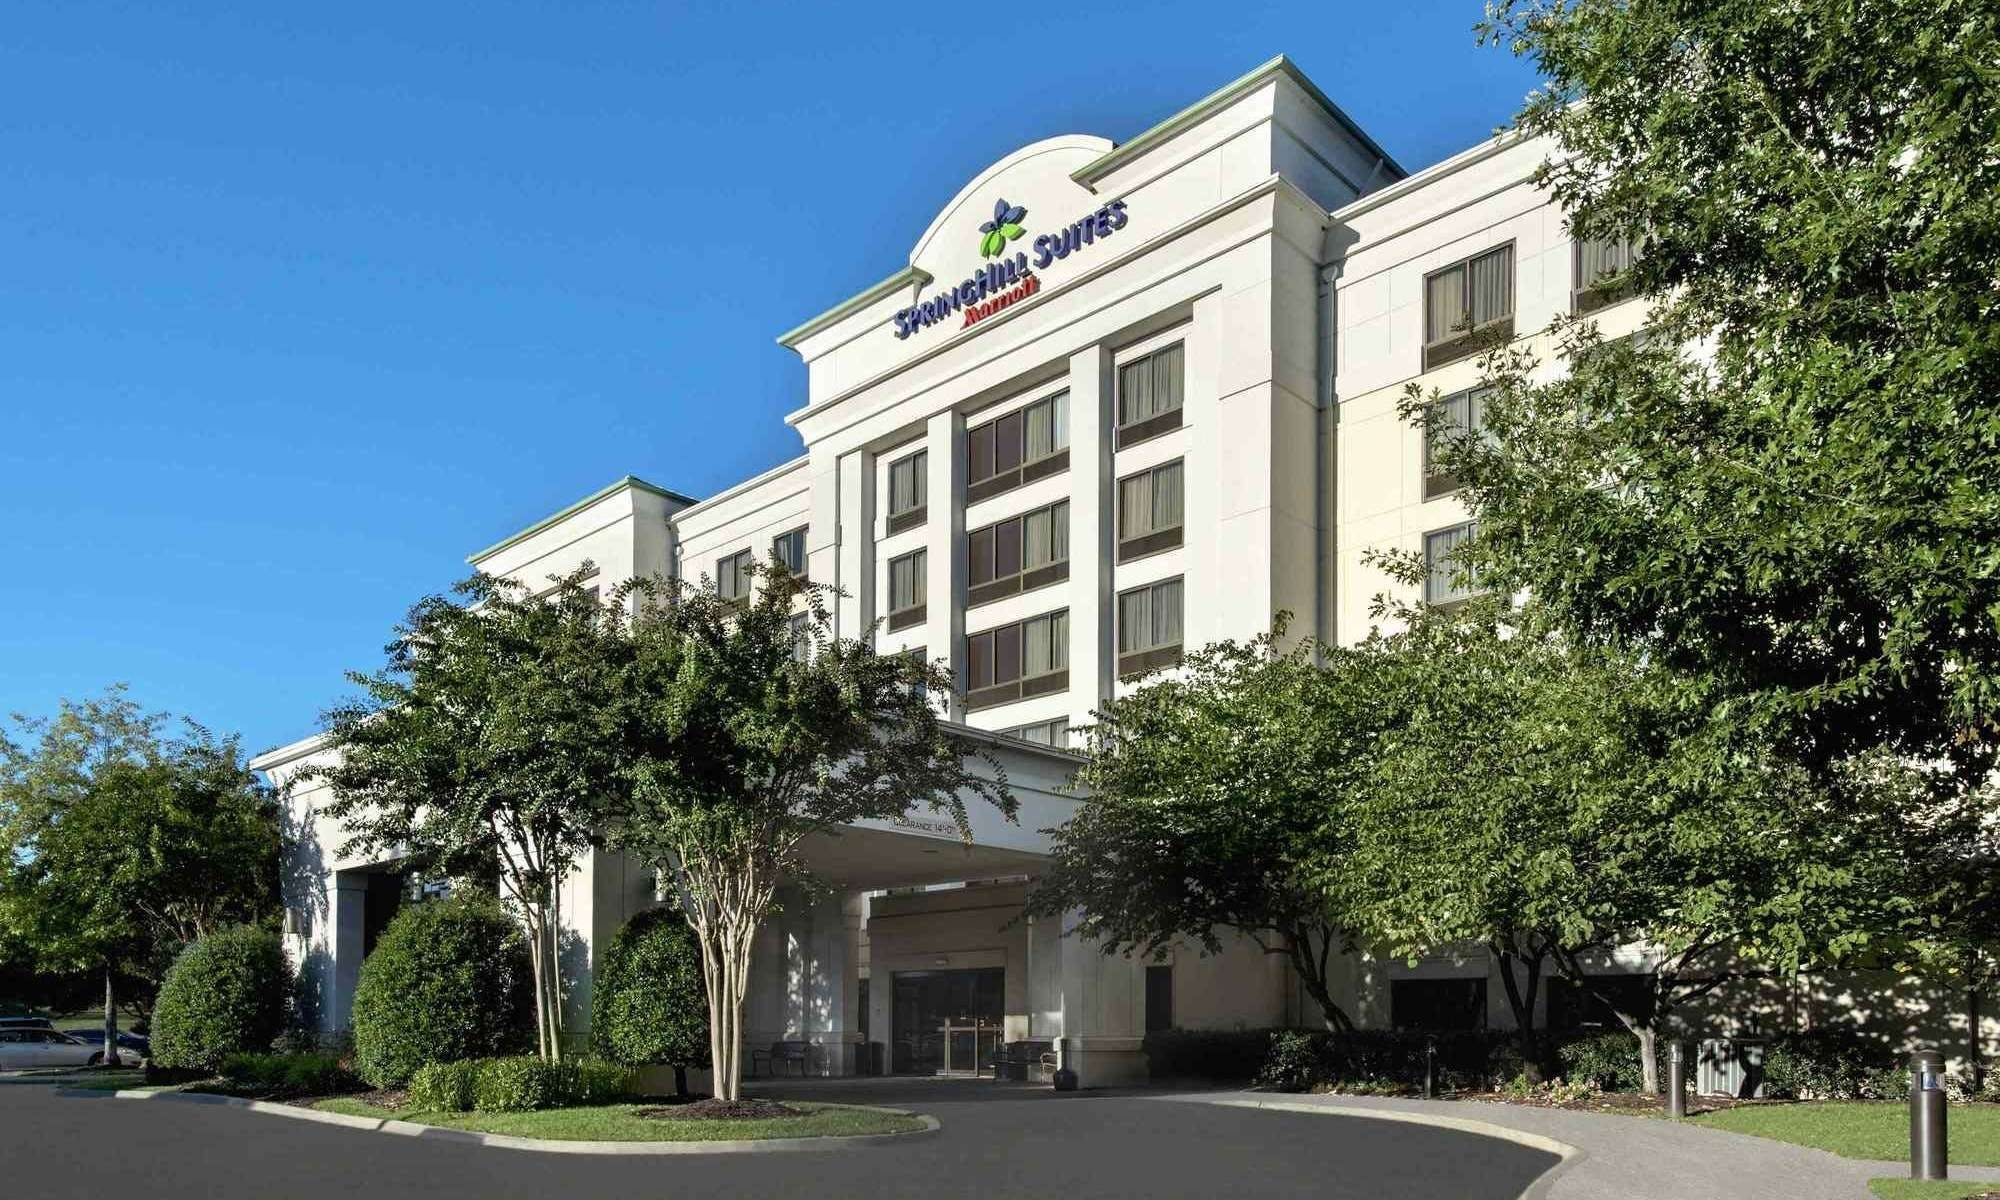 Cheap Hotels in Nashville